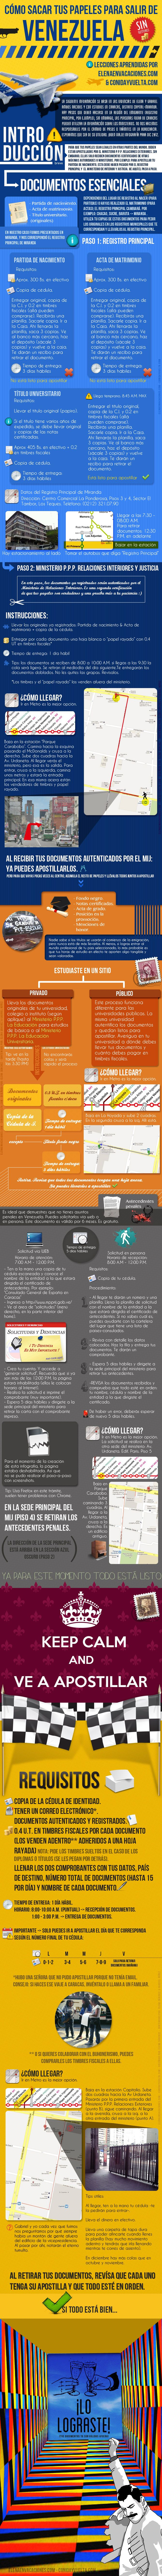 Cómo sacar tus papeles para salir de Venezuela #infografia... coño, muy útil para cuando me vaya.